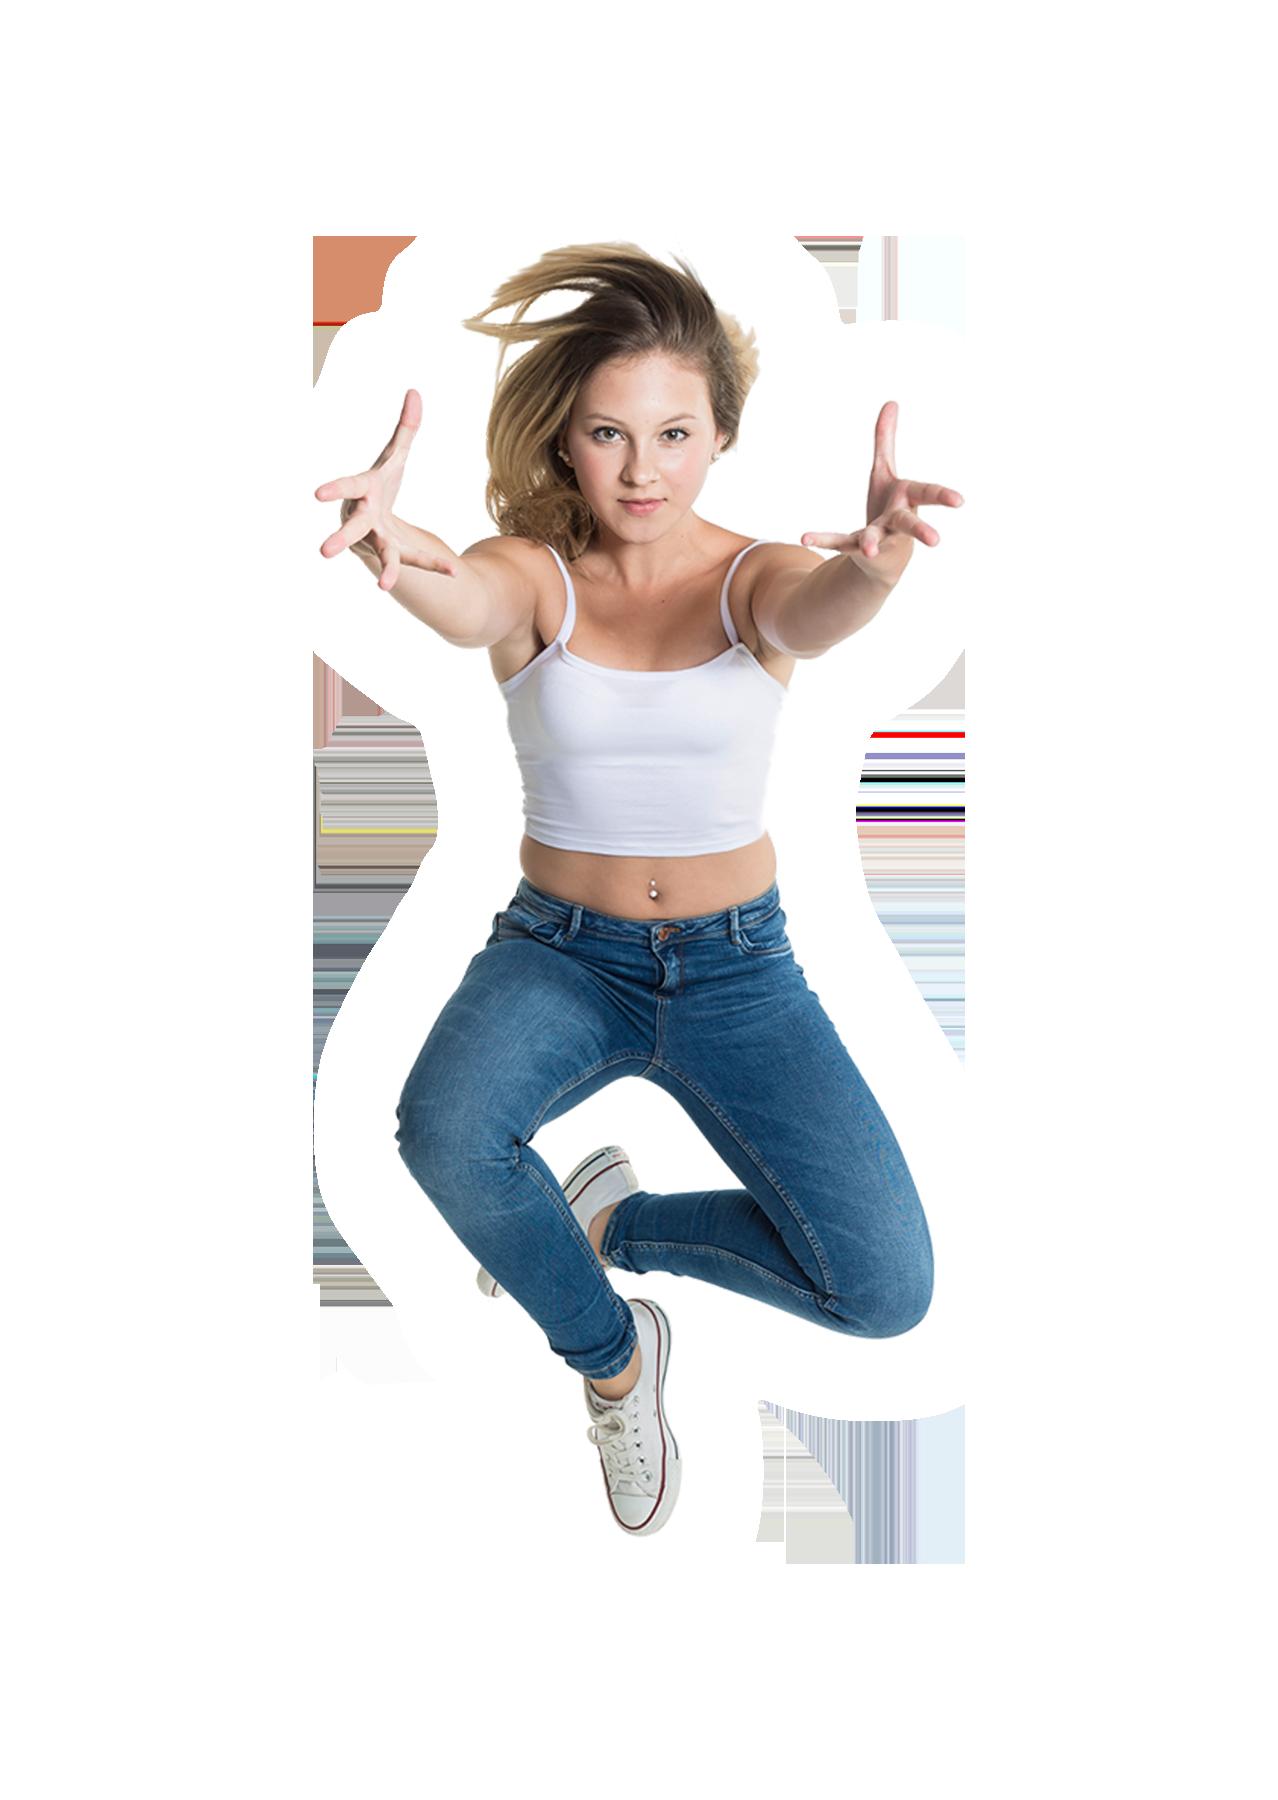 Dancers_Menschen_Michi